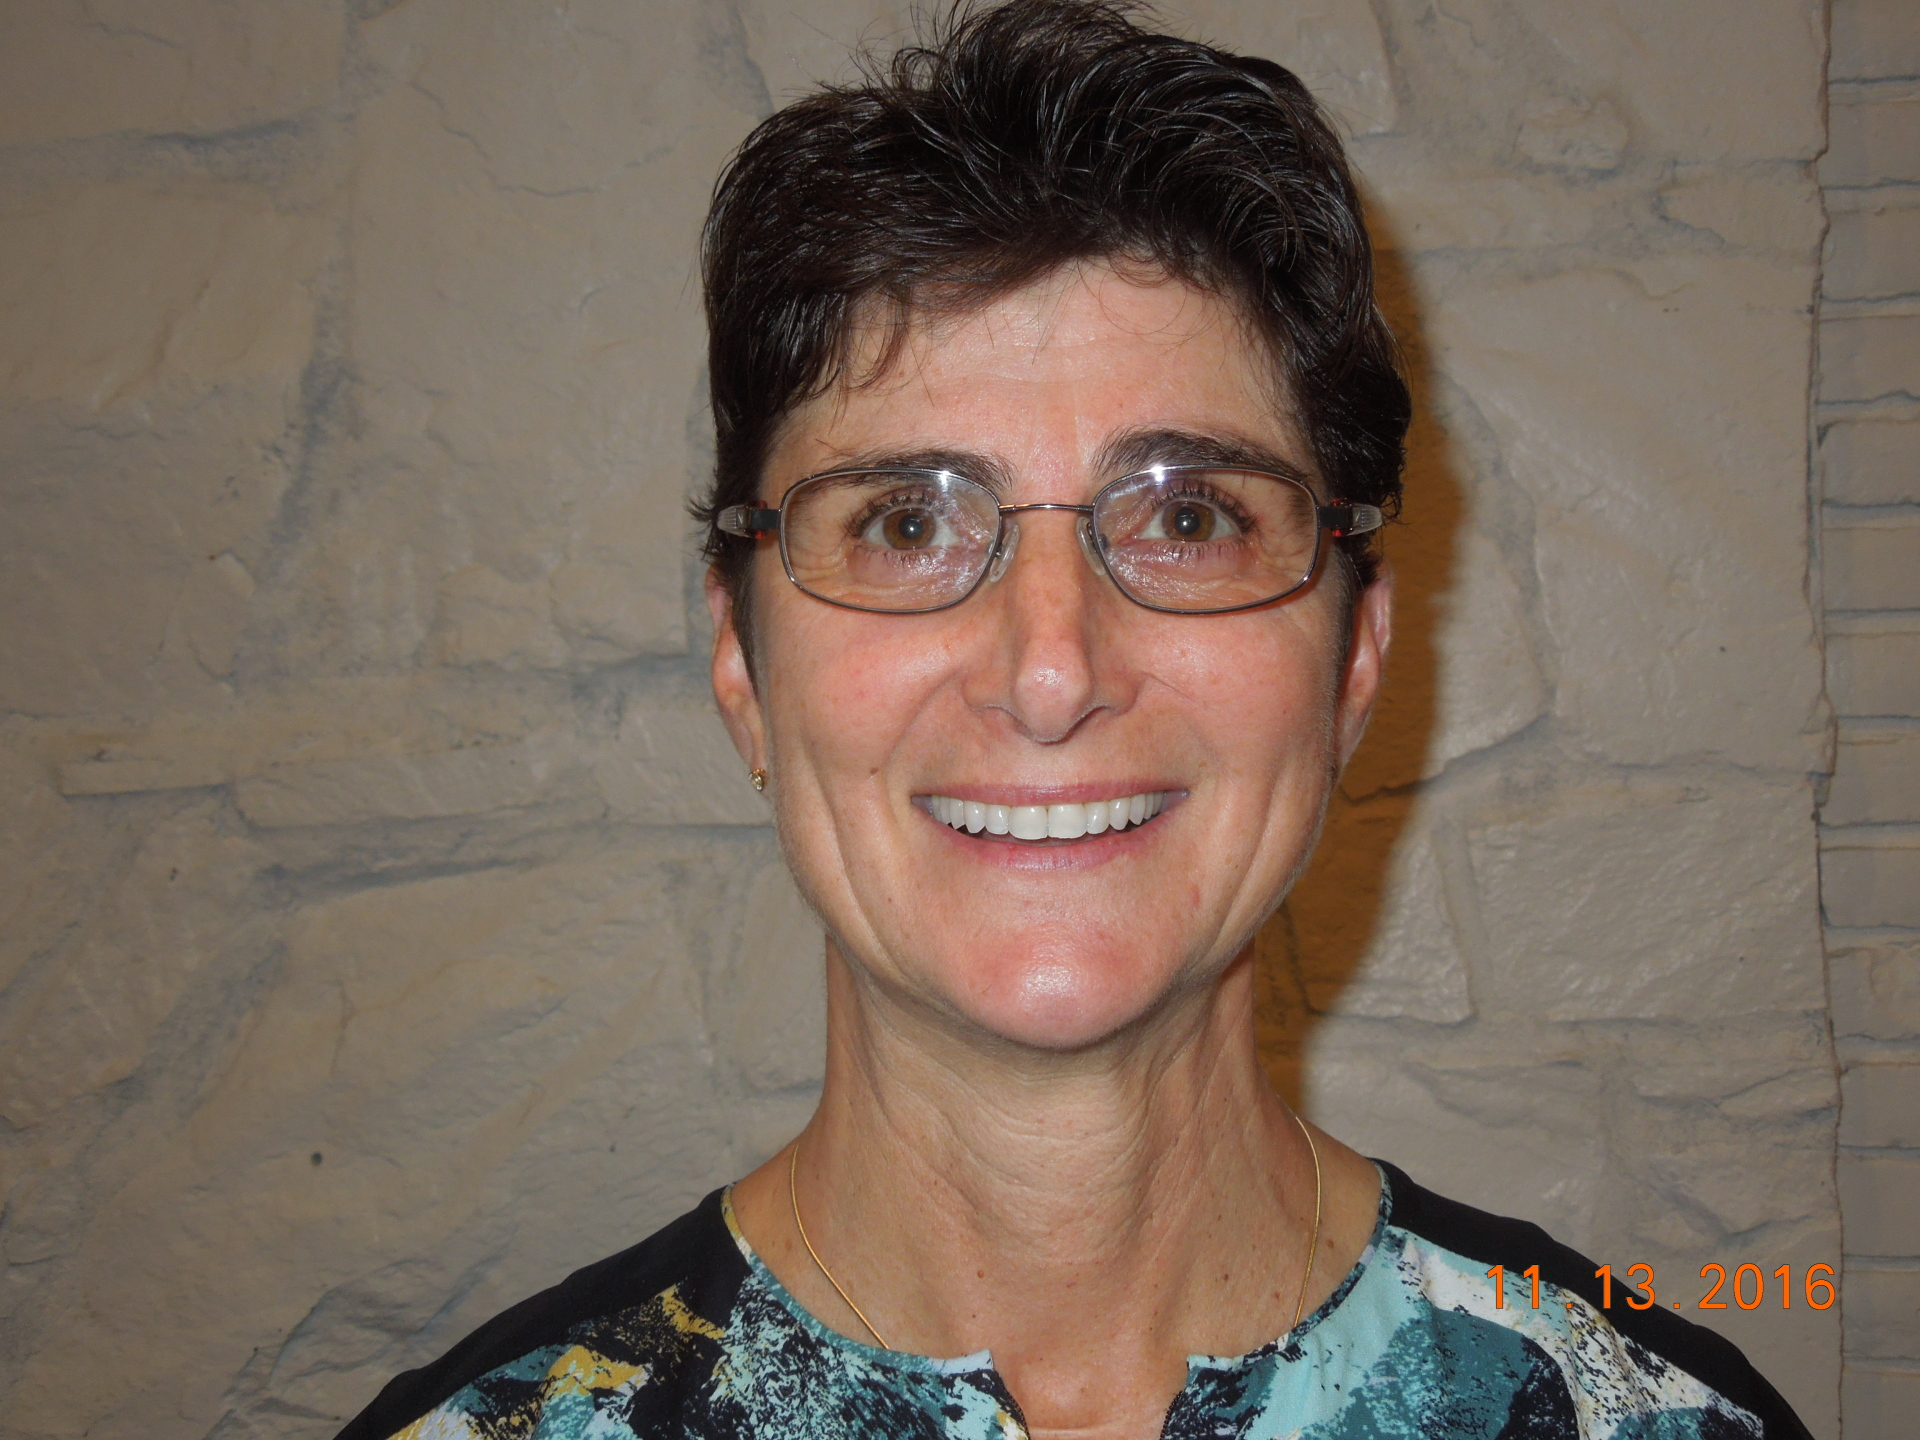 Julie Spector